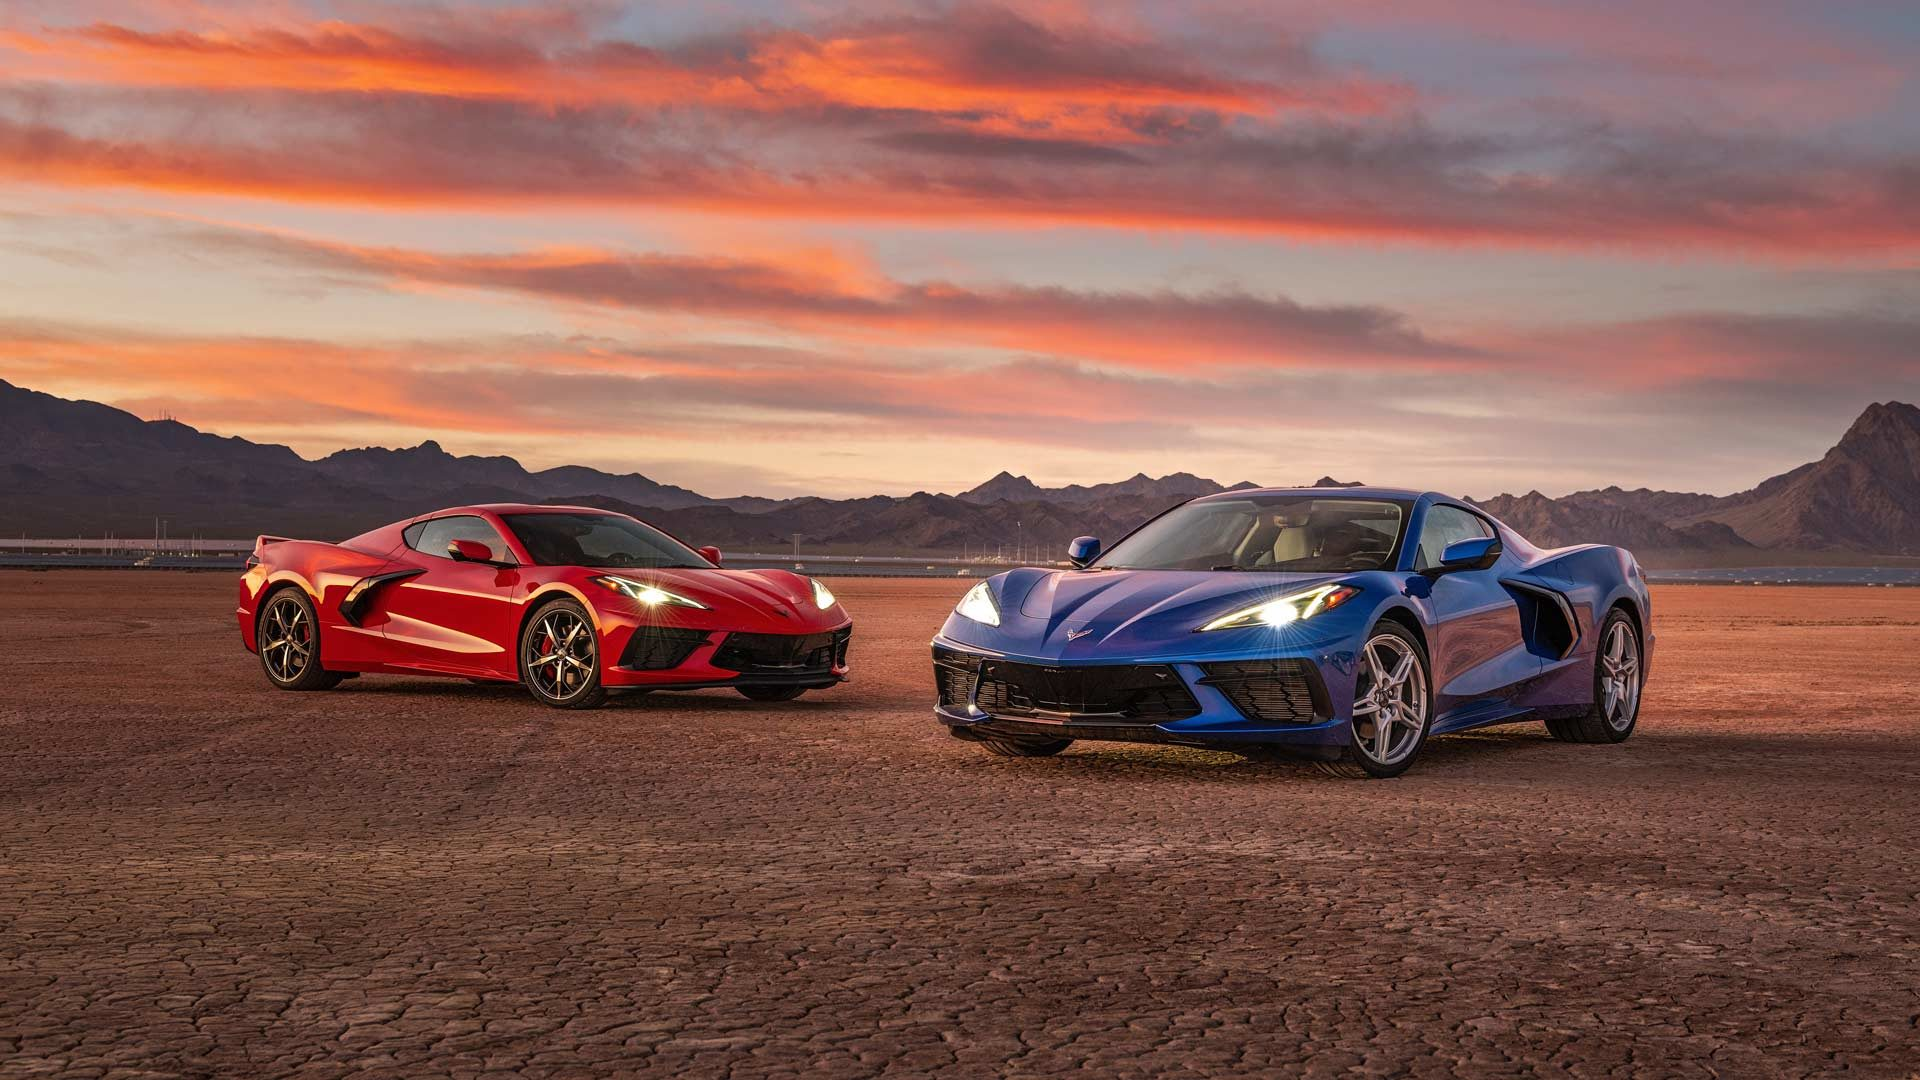 RHD Chevrolet Corvette Launch Date